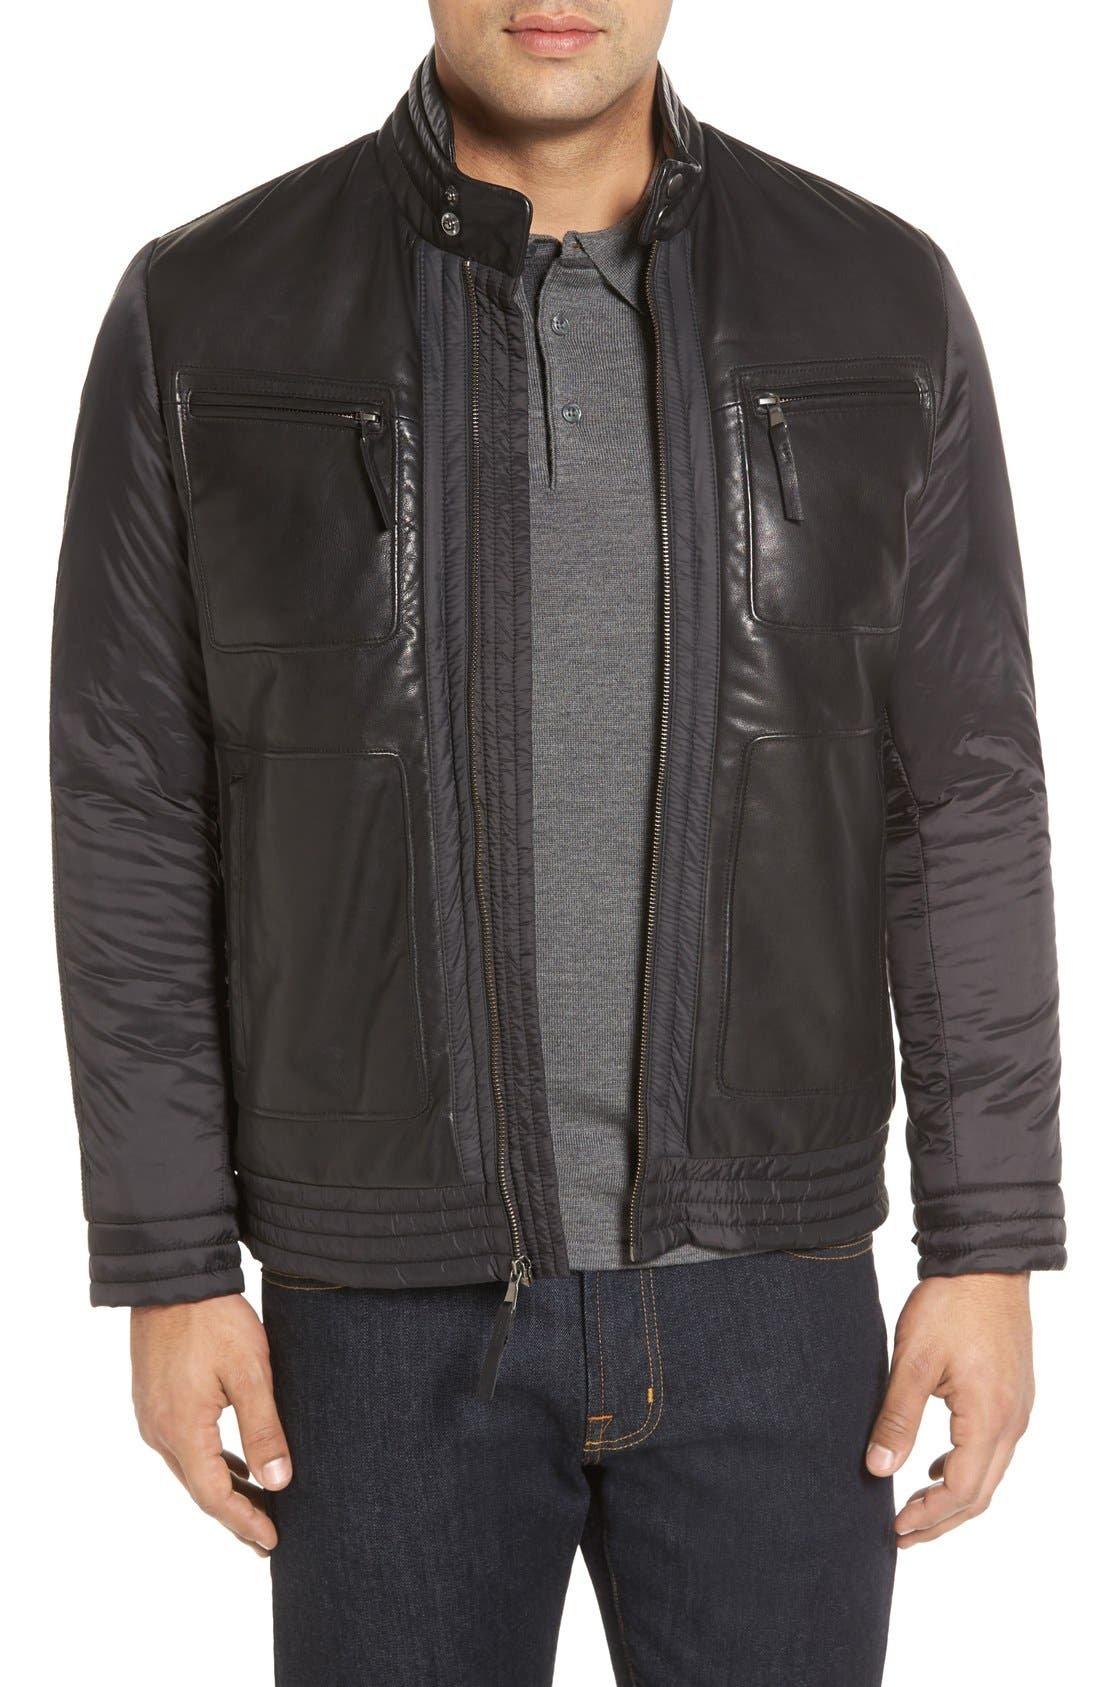 Alternate Image 1 Selected - Missani Le Collezioni Leather Trimmed Nylon Jacket